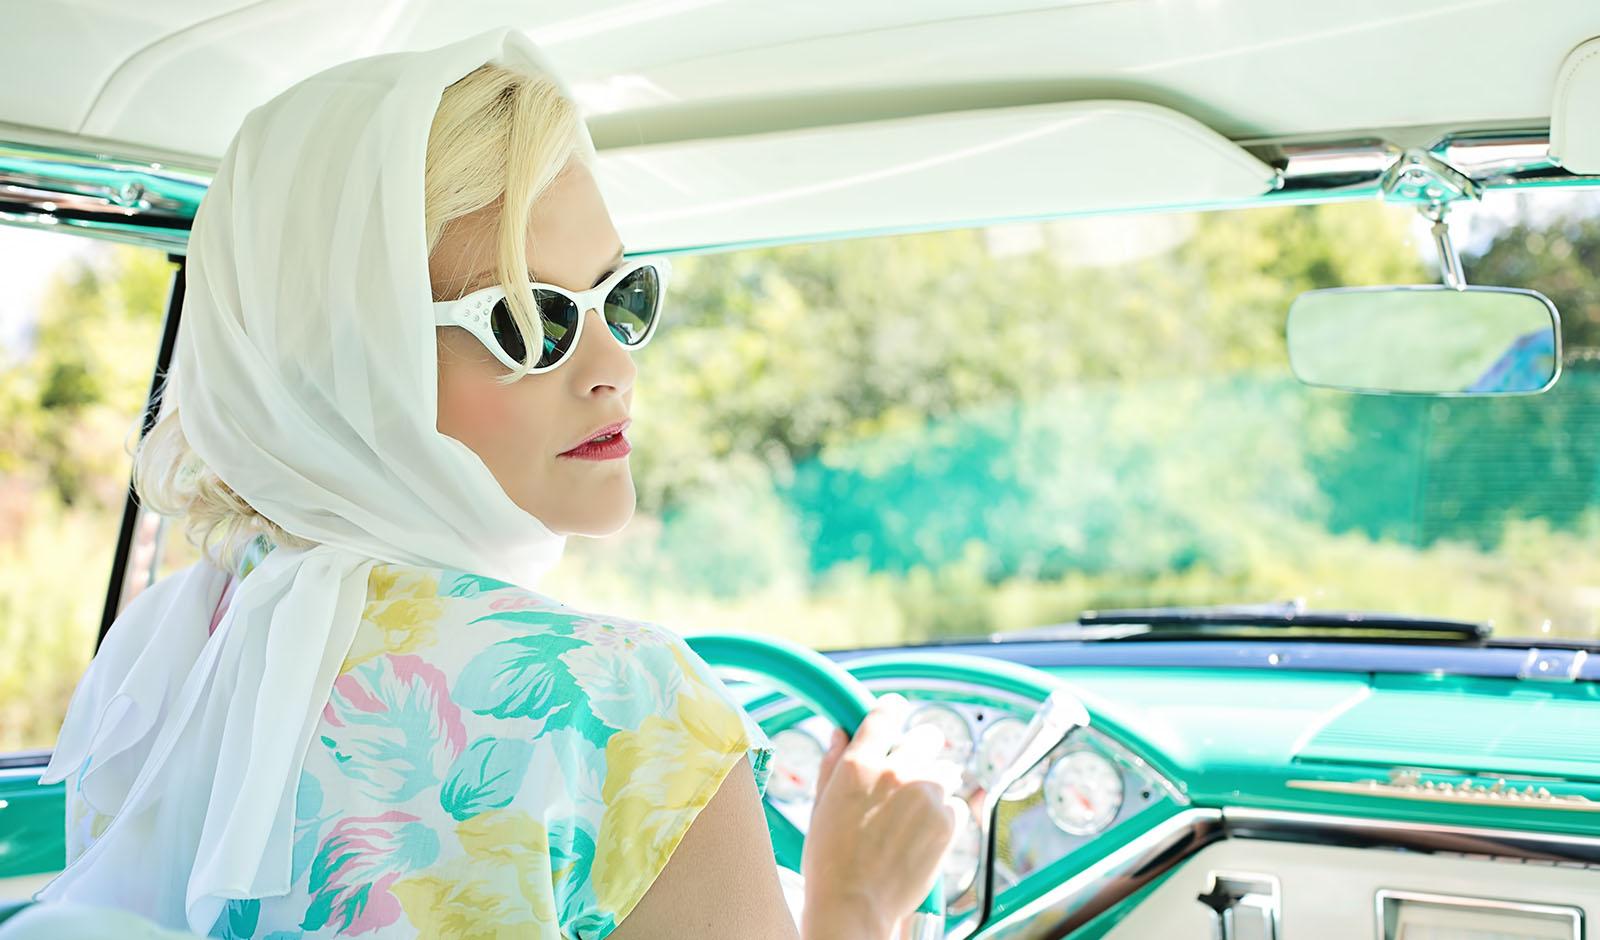 vintage-woman-driving-vintage-car-on-road-during-daytime-33678